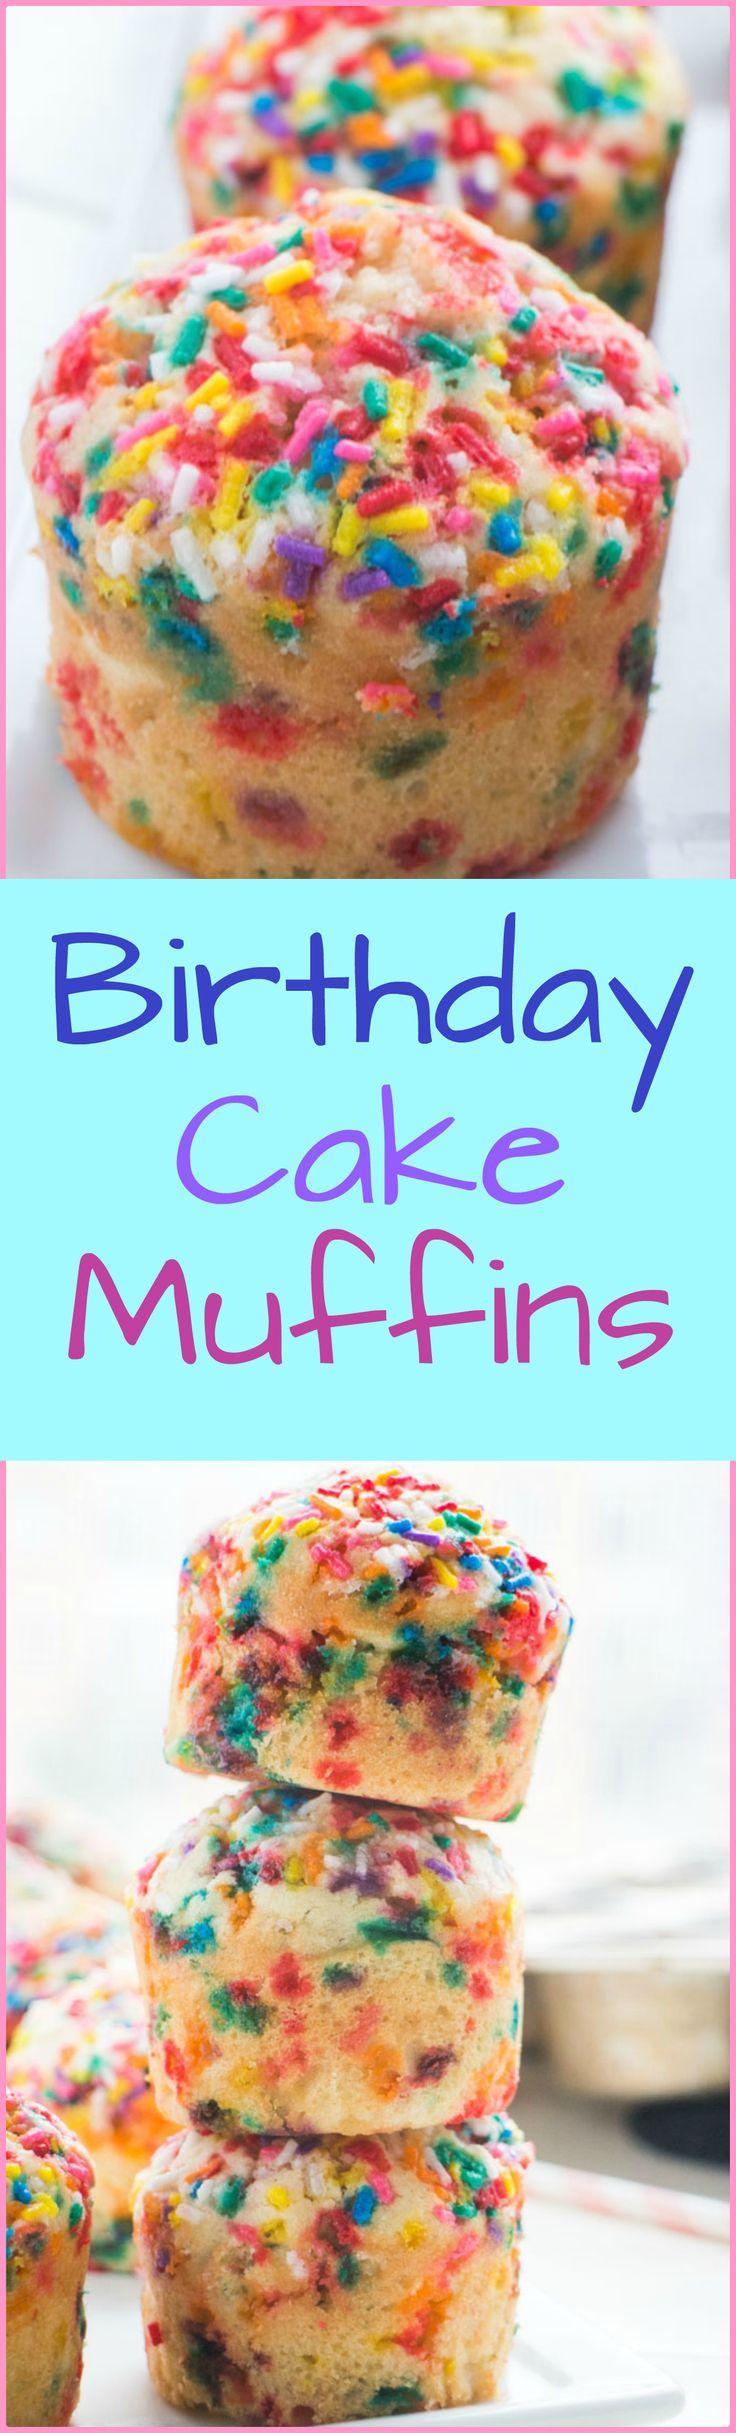 Fluffy Birthday Cake Muffins that taste just like cake! Recipe makes 12 muffins.